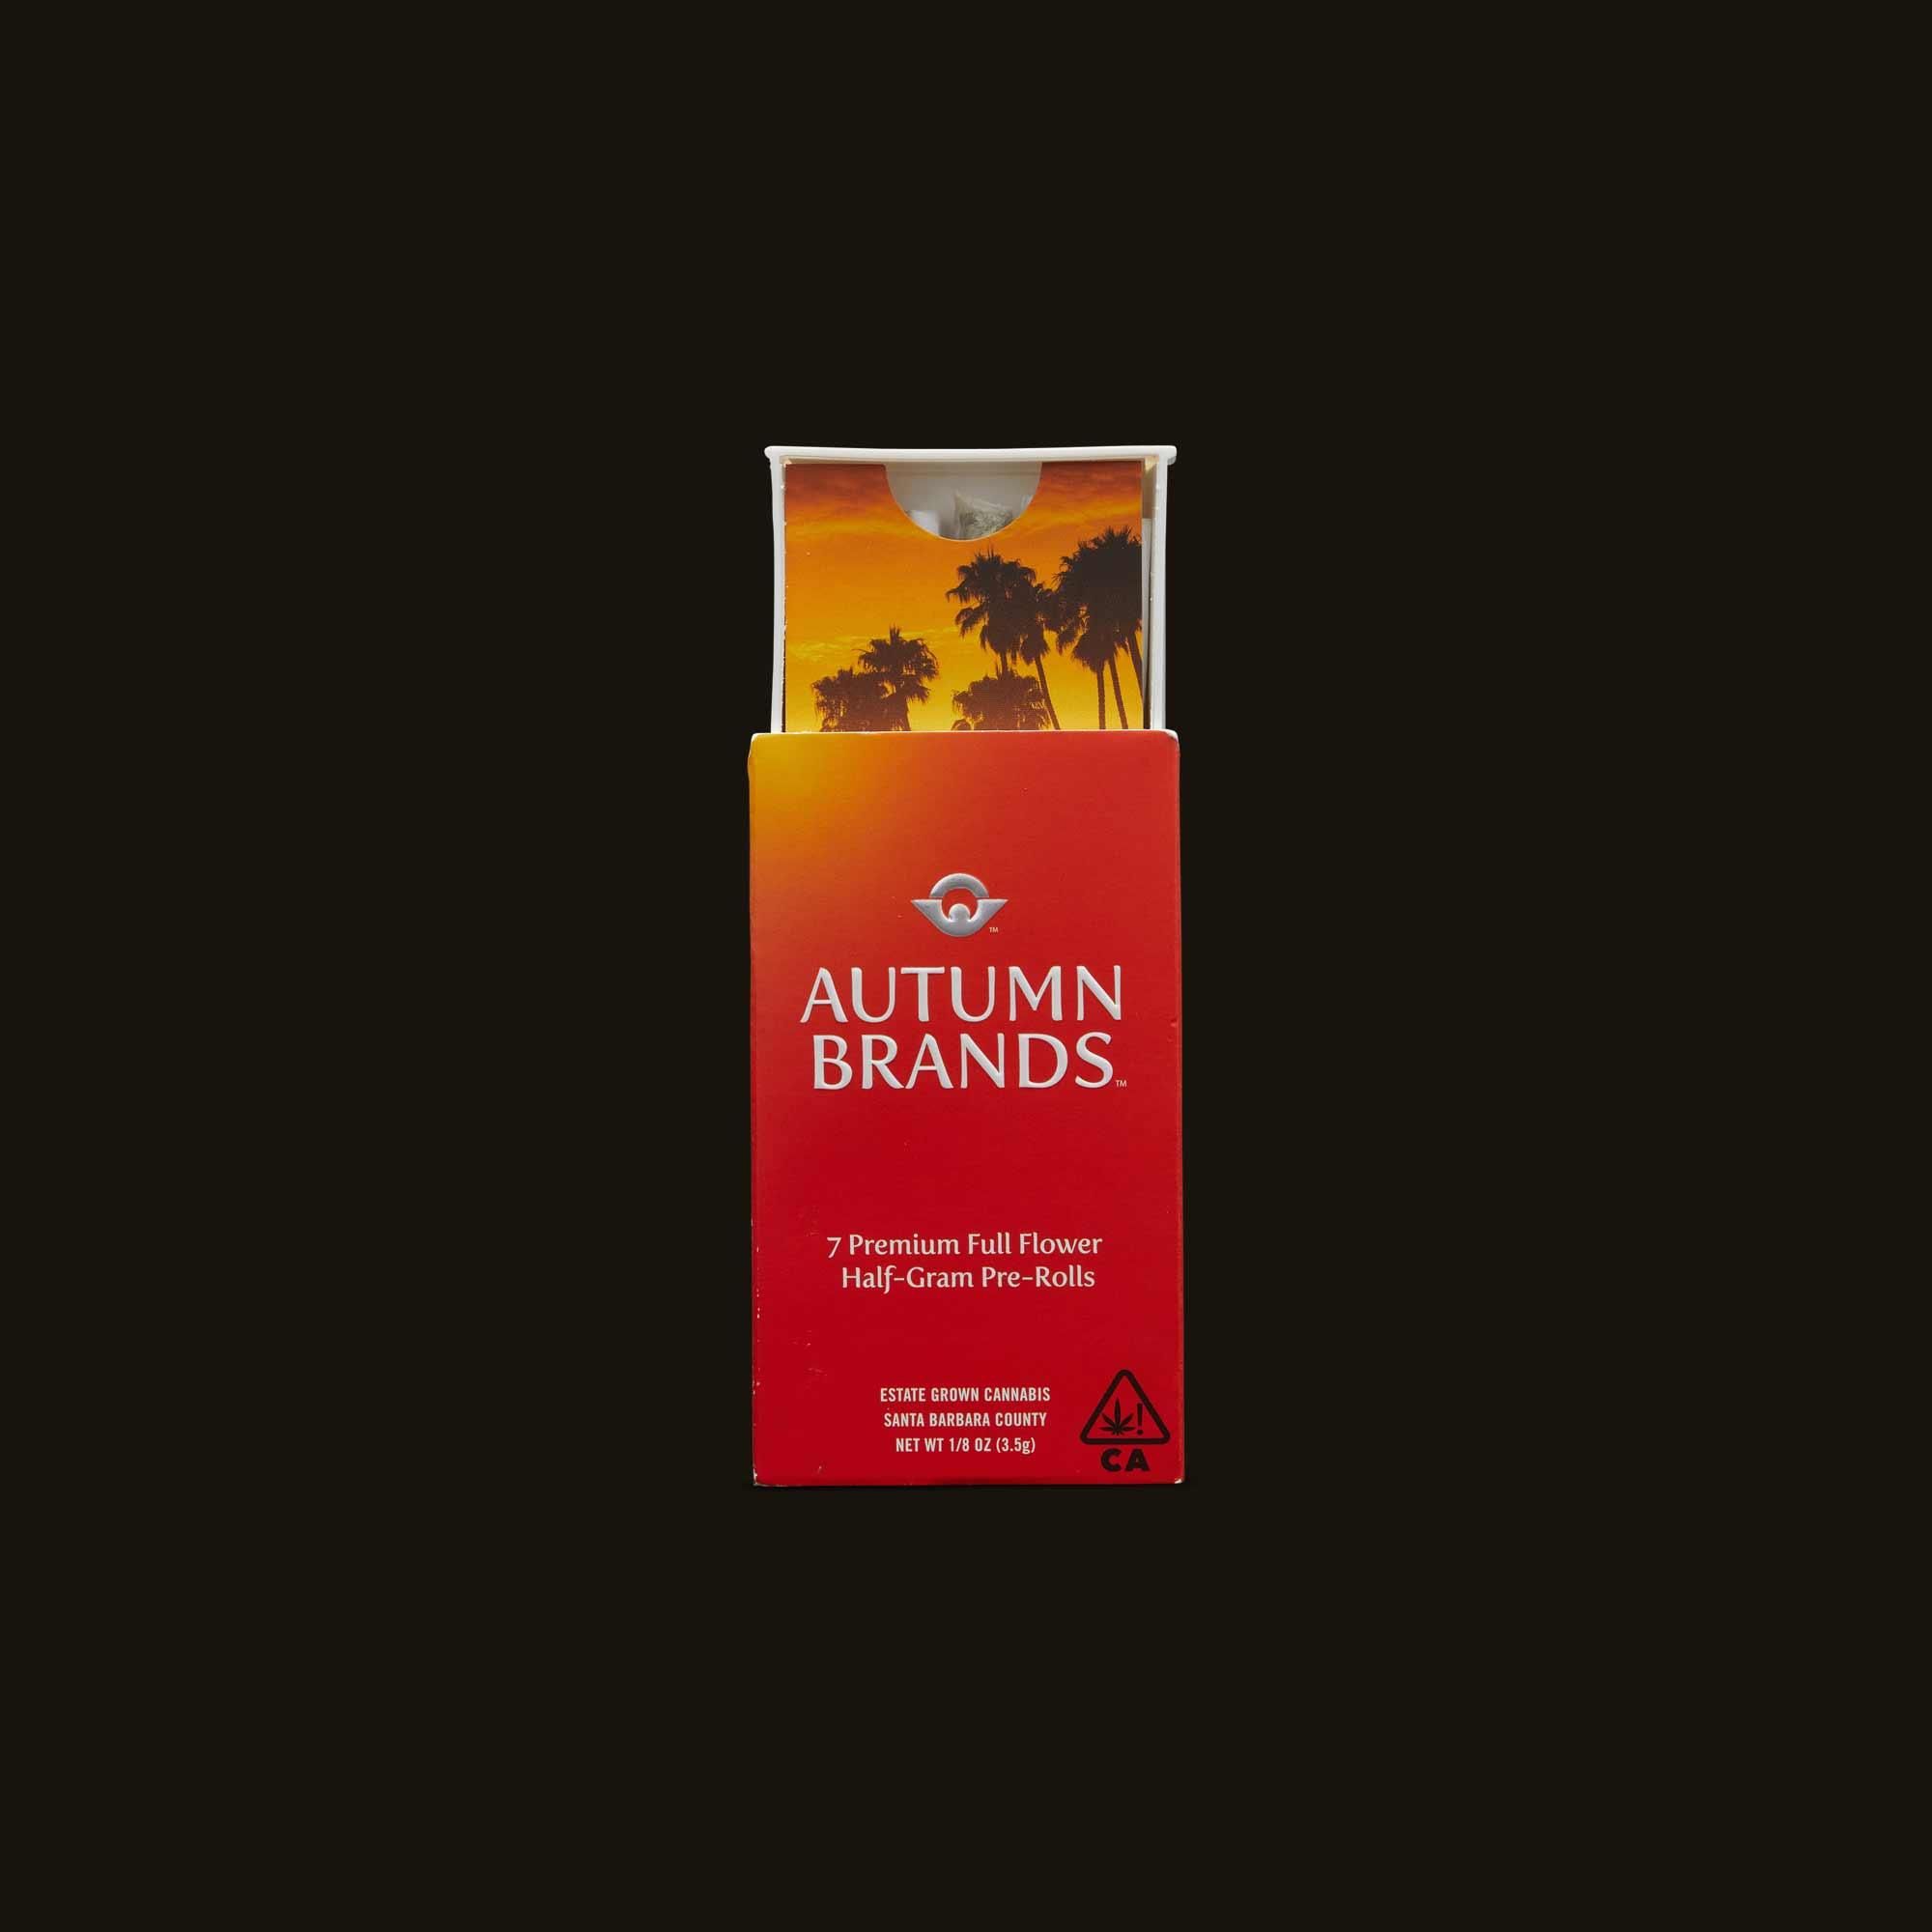 Medium Pre-Rolls by Autumn Brands